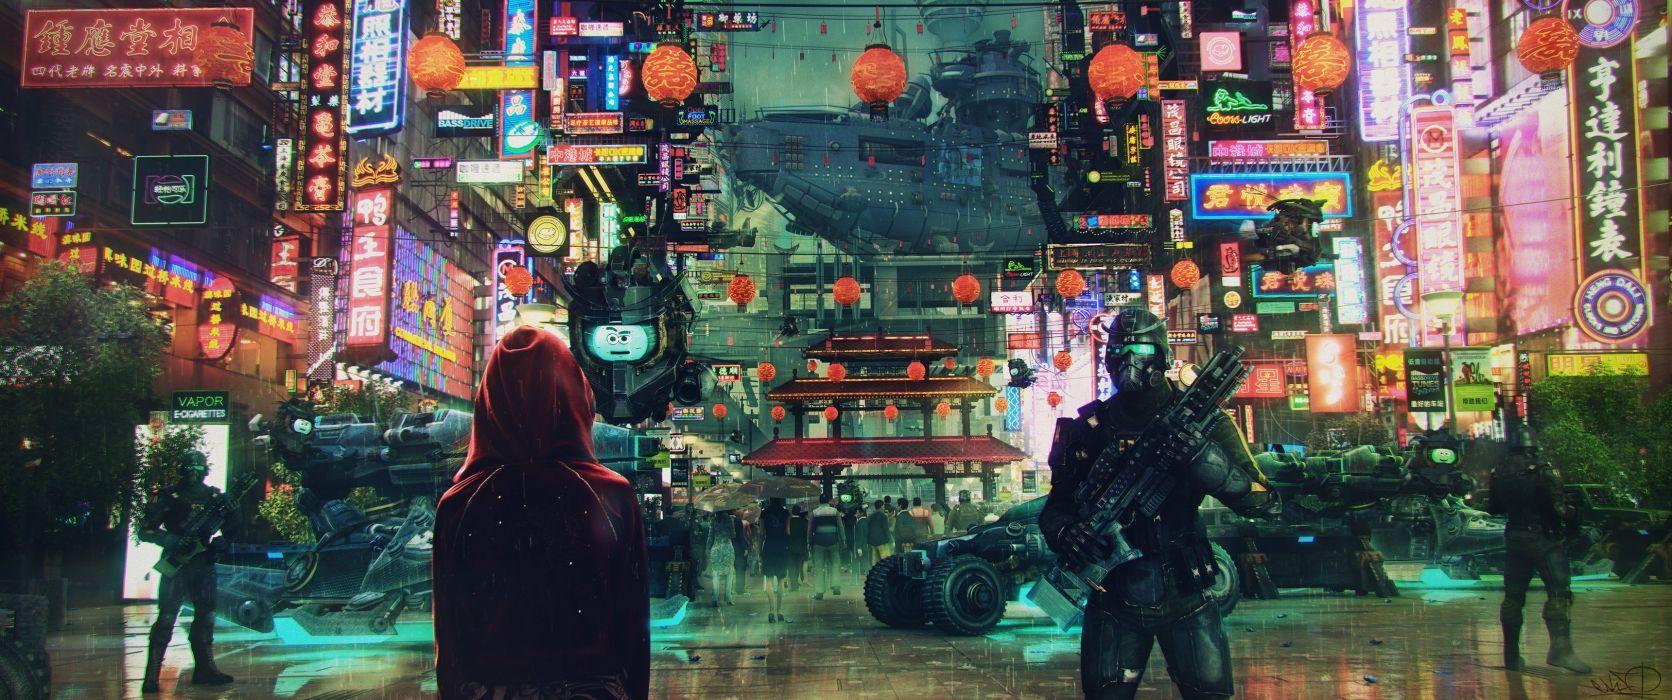 Science fiction cyberpunk cityscape